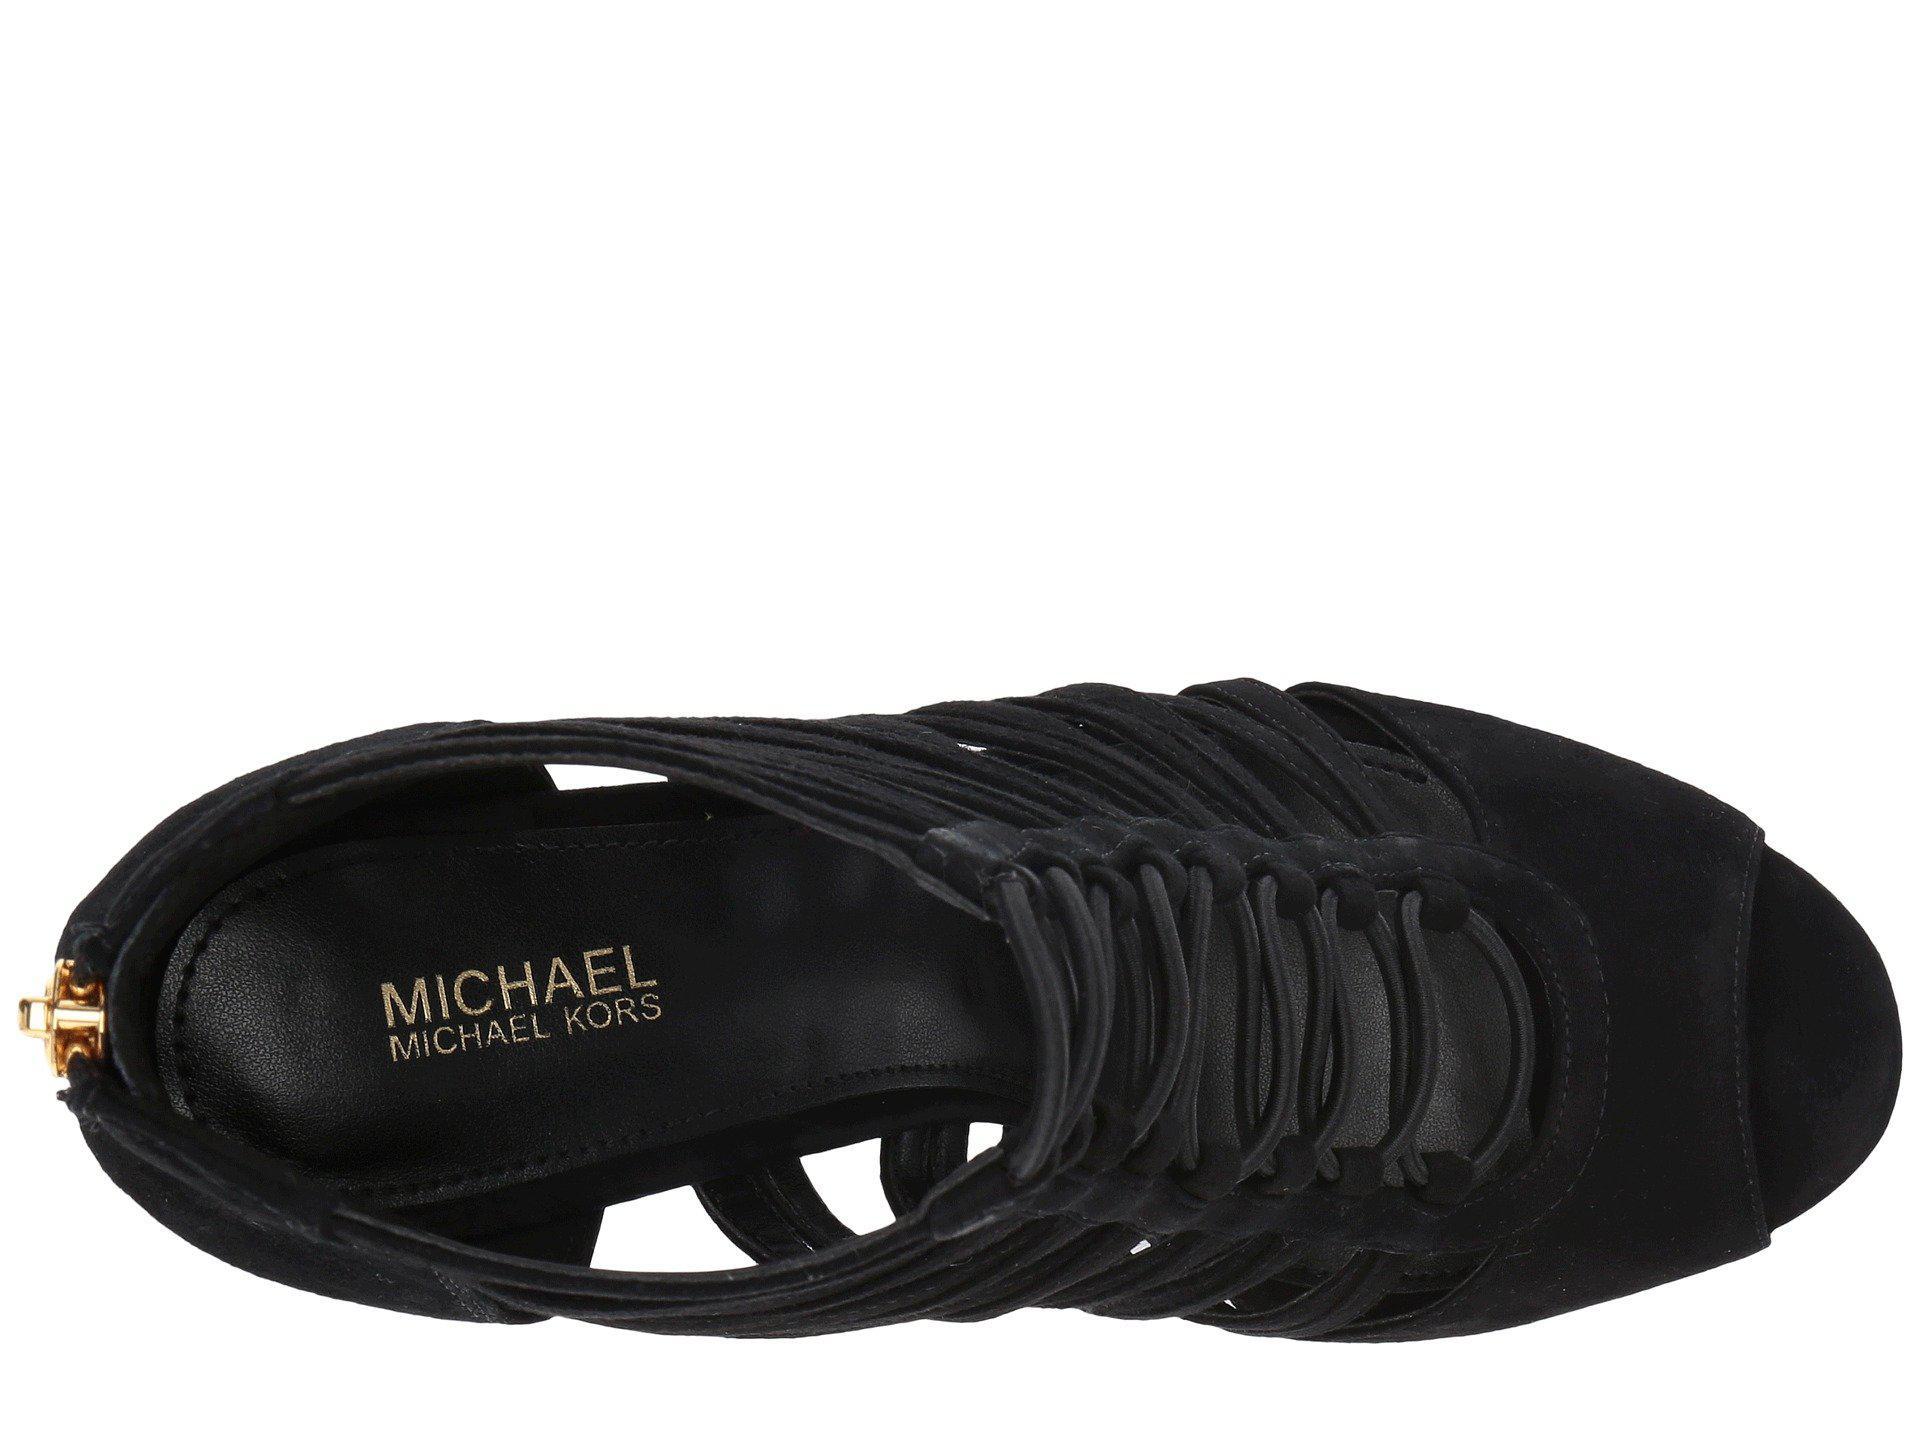 33a85758c7d Lyst - MICHAEL Michael Kors Clarissa Platform in Black